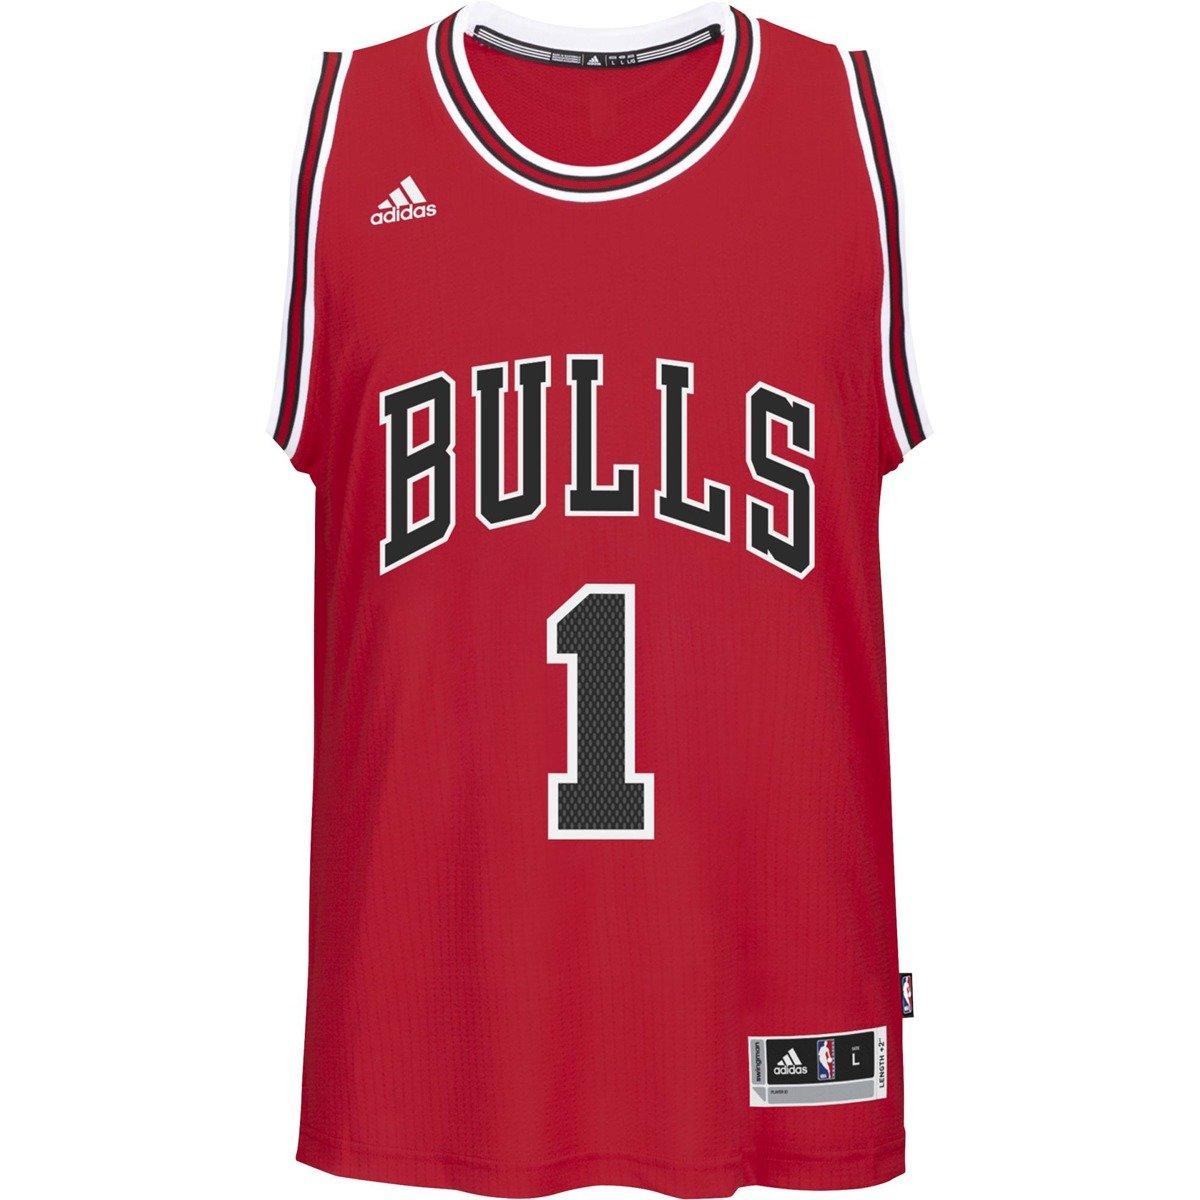 Adidas Swingman Derrick Rose Chicago Bulls NBA Jersey ...